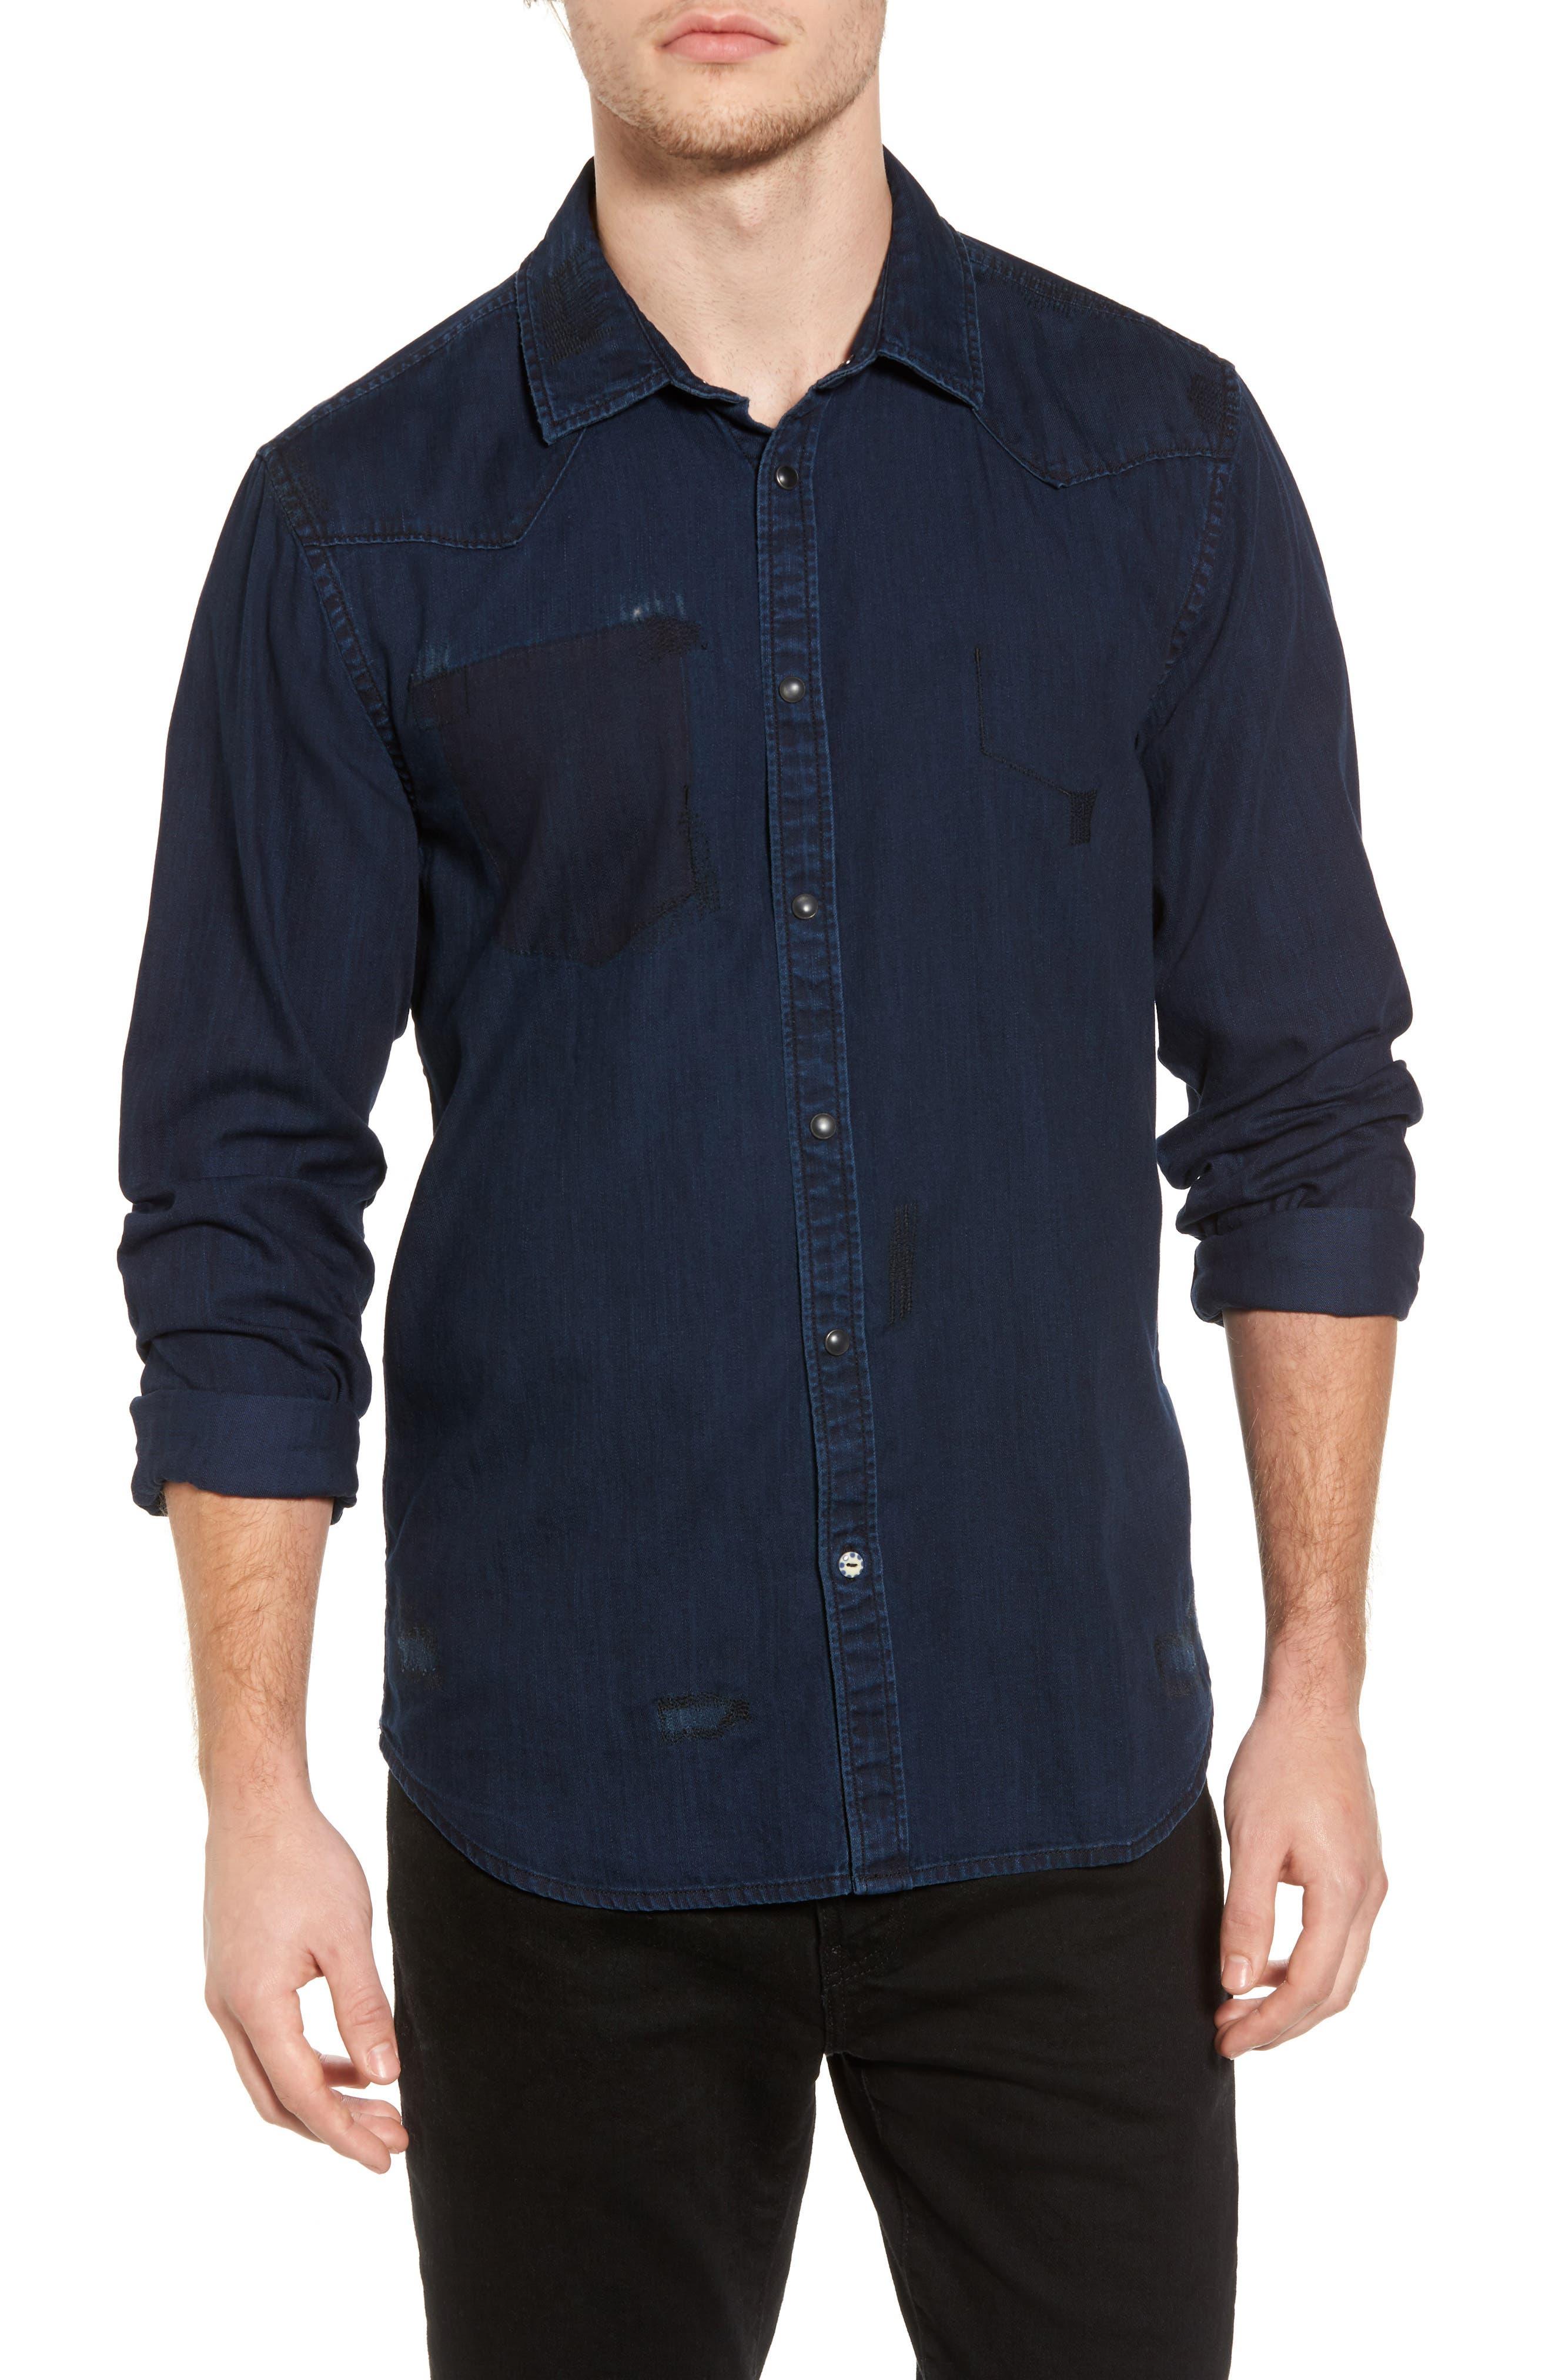 Pocketless Western Denim Shirt,                             Main thumbnail 1, color,                             Midnight